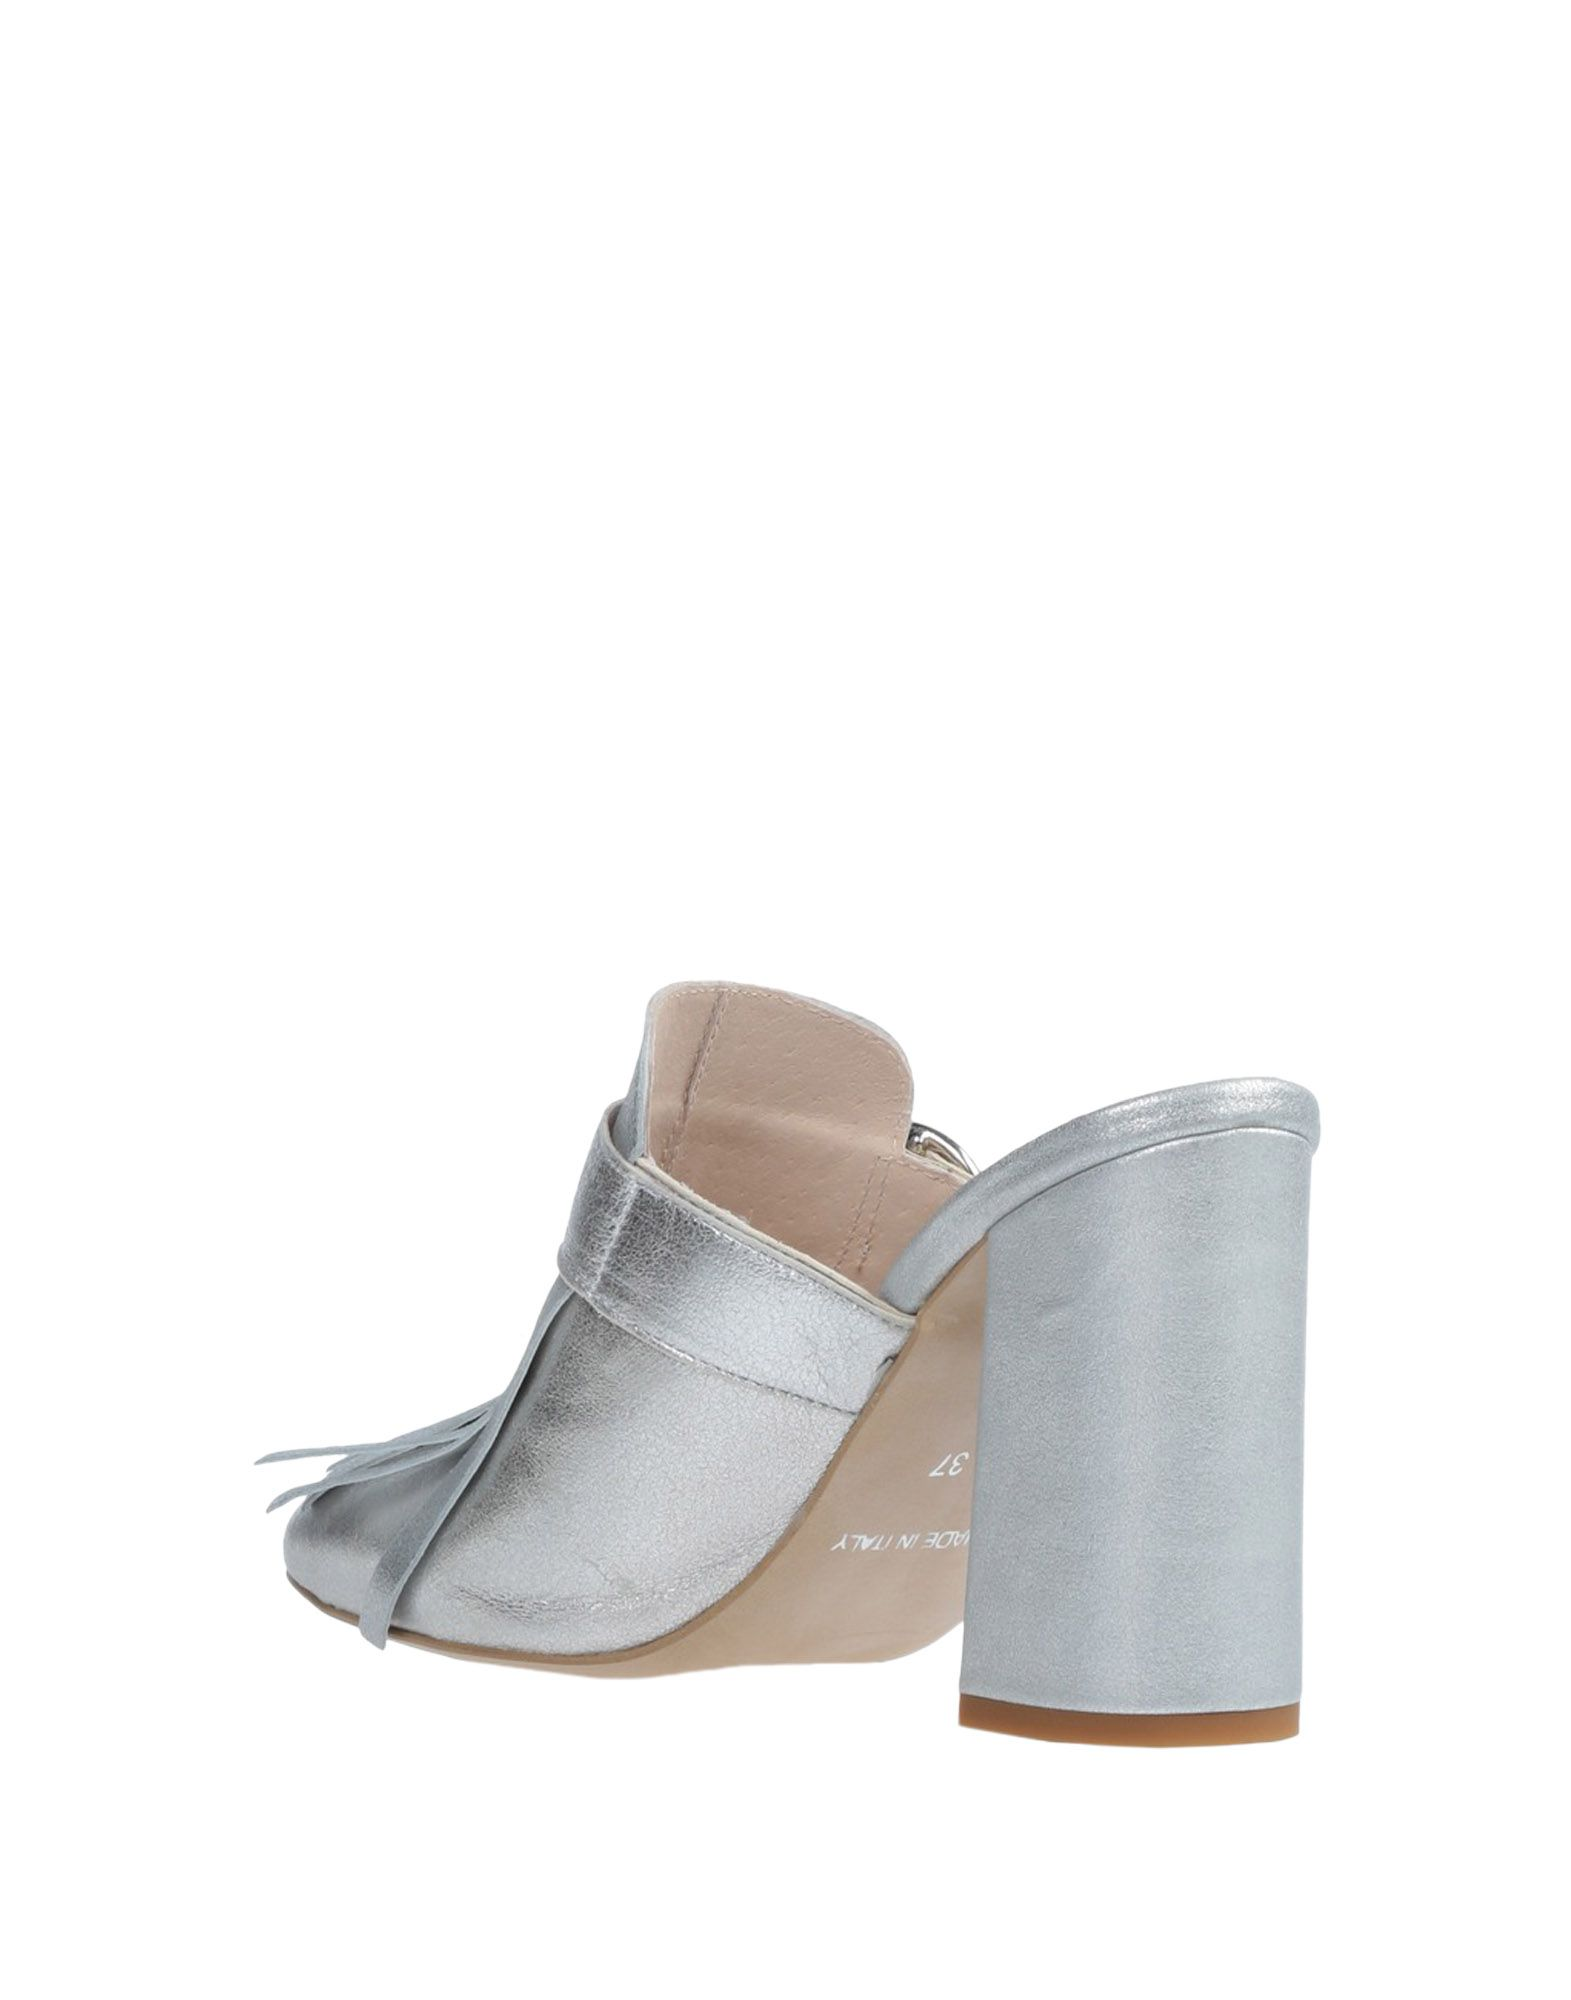 Divine Follie Pantoletten Damen Neue  11522965QG Neue Damen Schuhe 2f6d7b